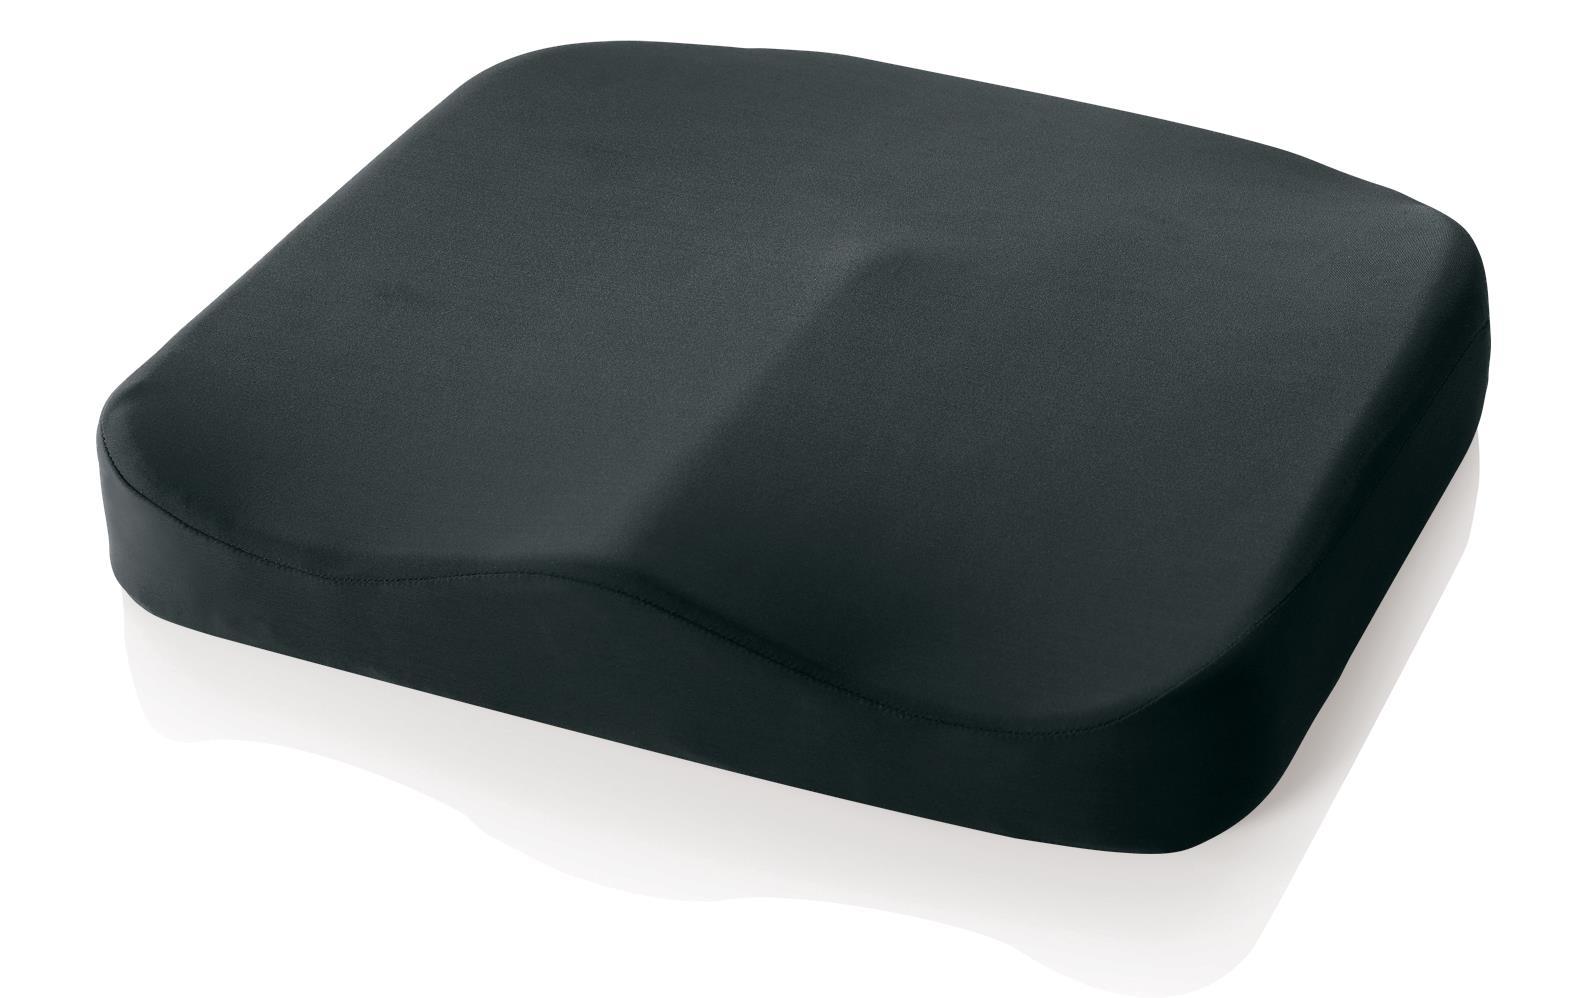 Tempur-Pedic Seat Cushion